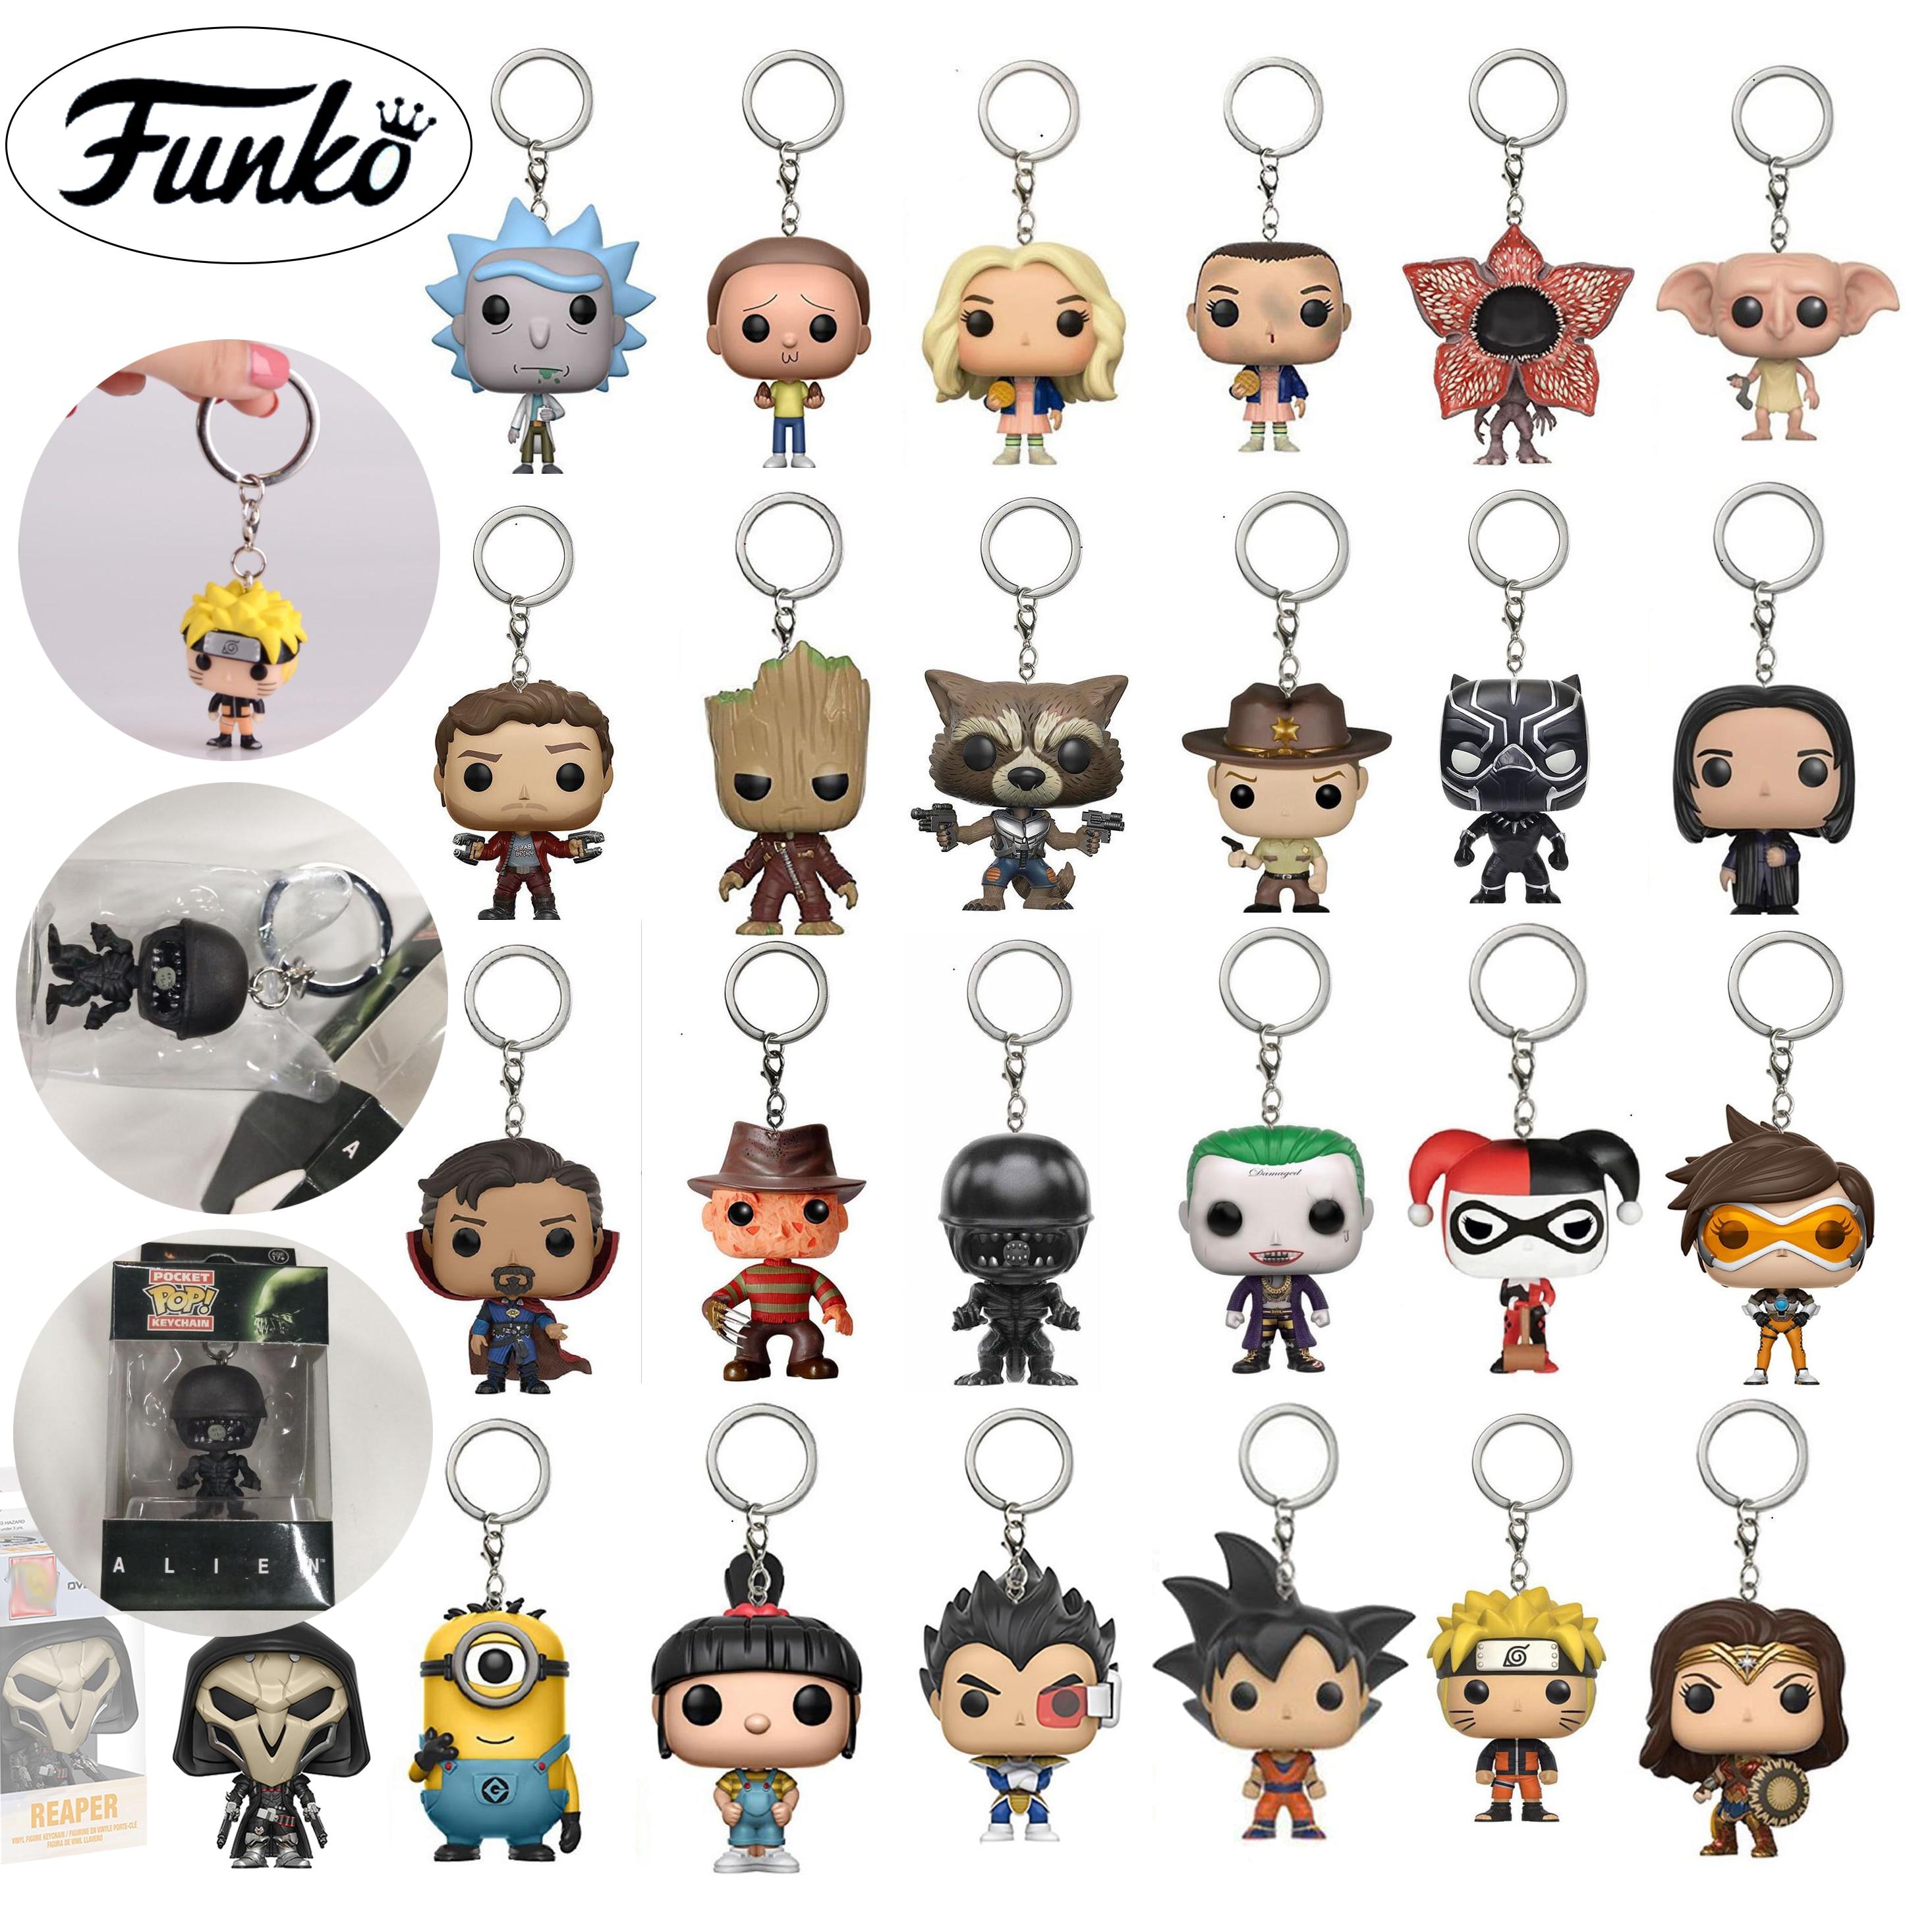 action-fun-keychain-toys-reaper-tracer-princess-ariel-font-b-marvel-b-font-avengers-doctor-strange-harri-potter-snape-mini-model-keychain-toys